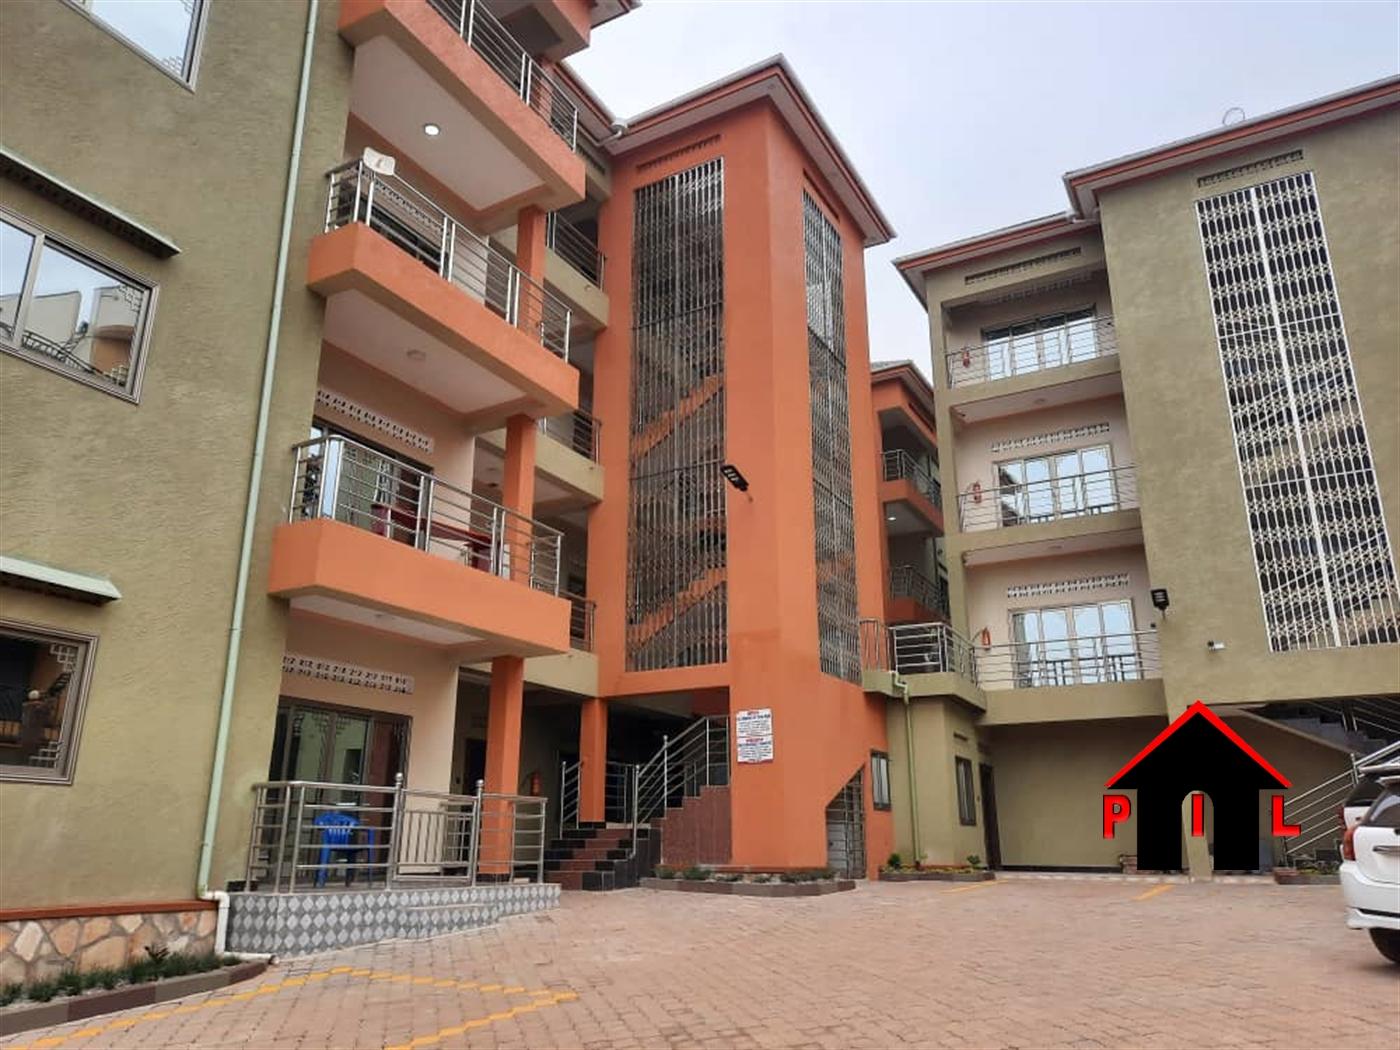 Apartment block for sale in Lubaga Kampala